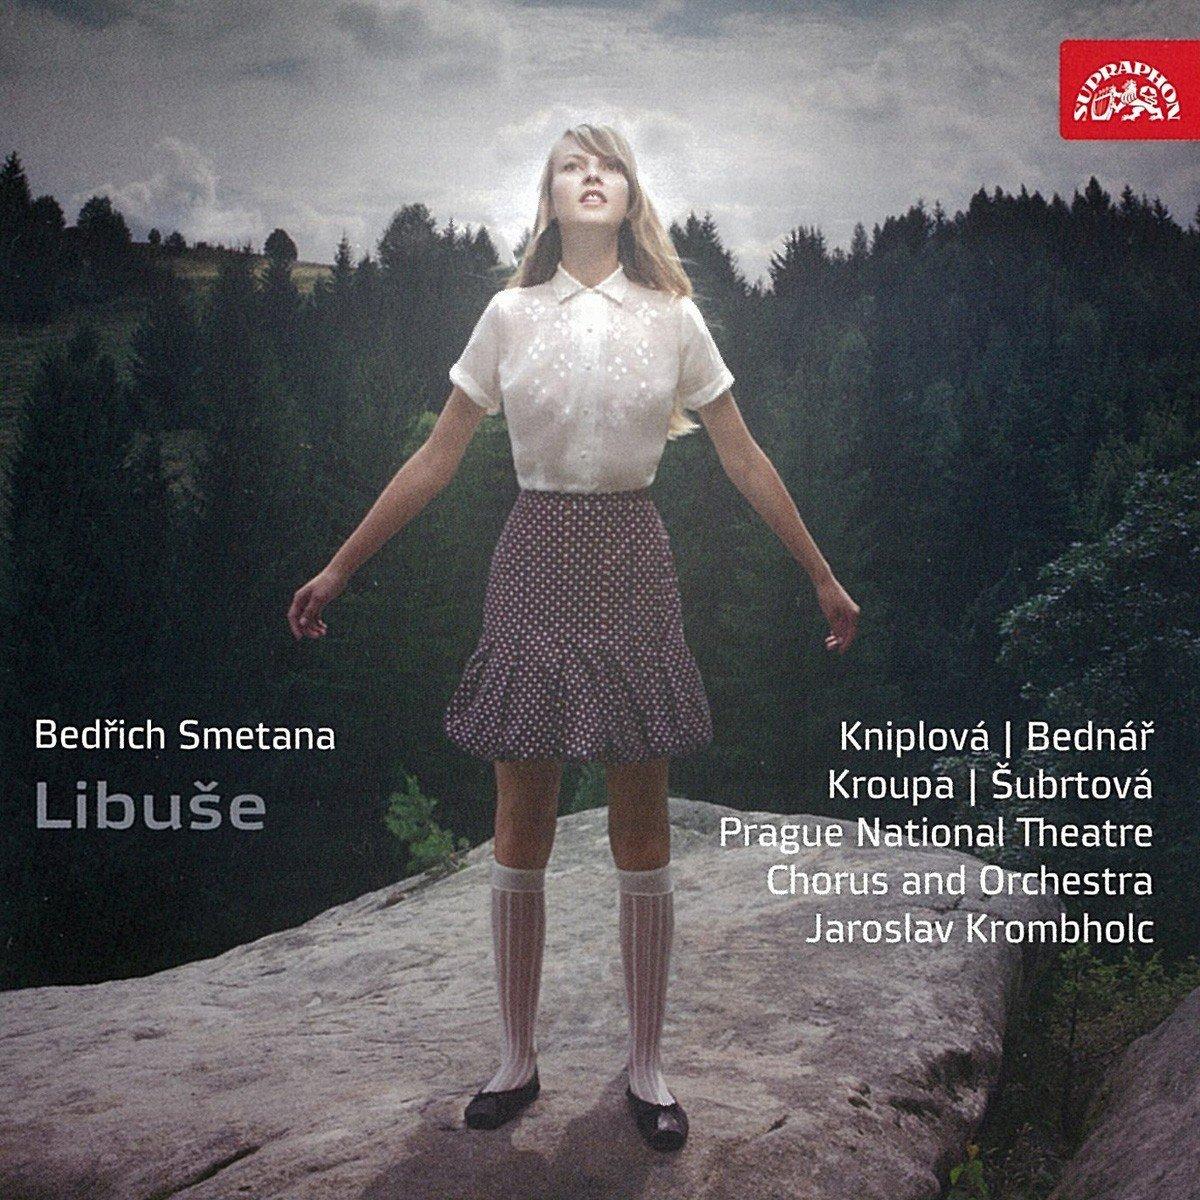 Bedrich Smetana Jaroslav Krombholc Prague National Theatre Chorus